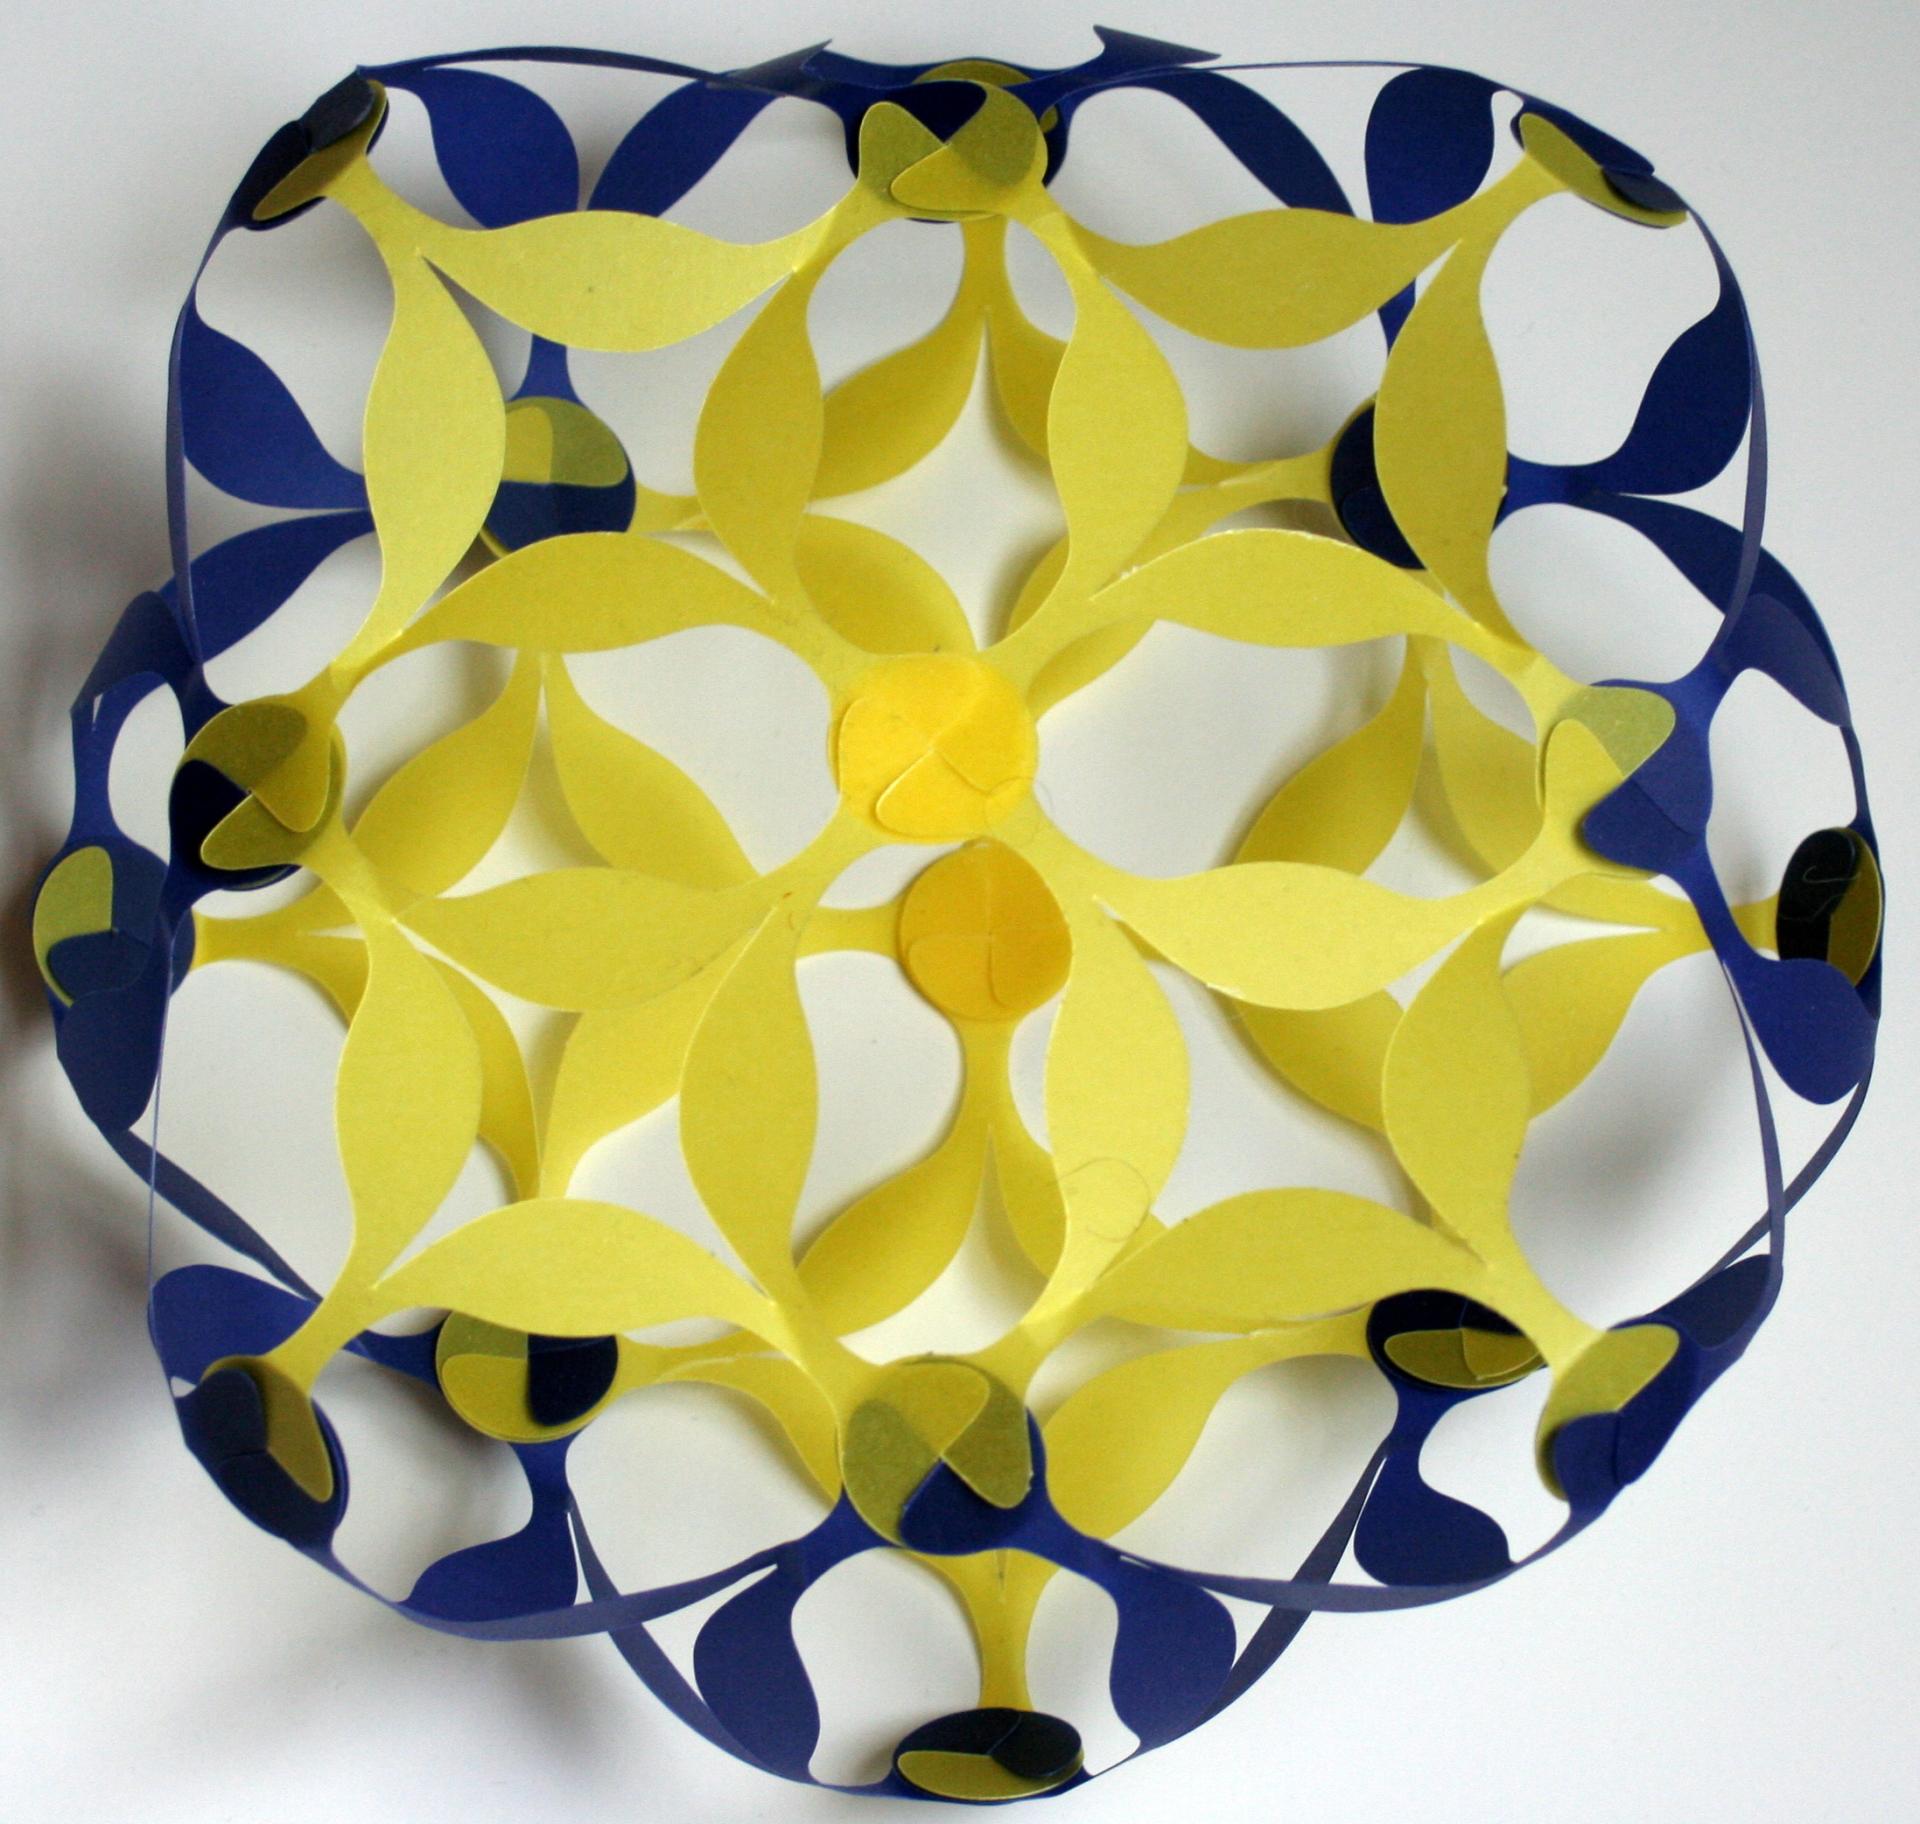 Square antiprism + tetragonal trapezohedron dual compound